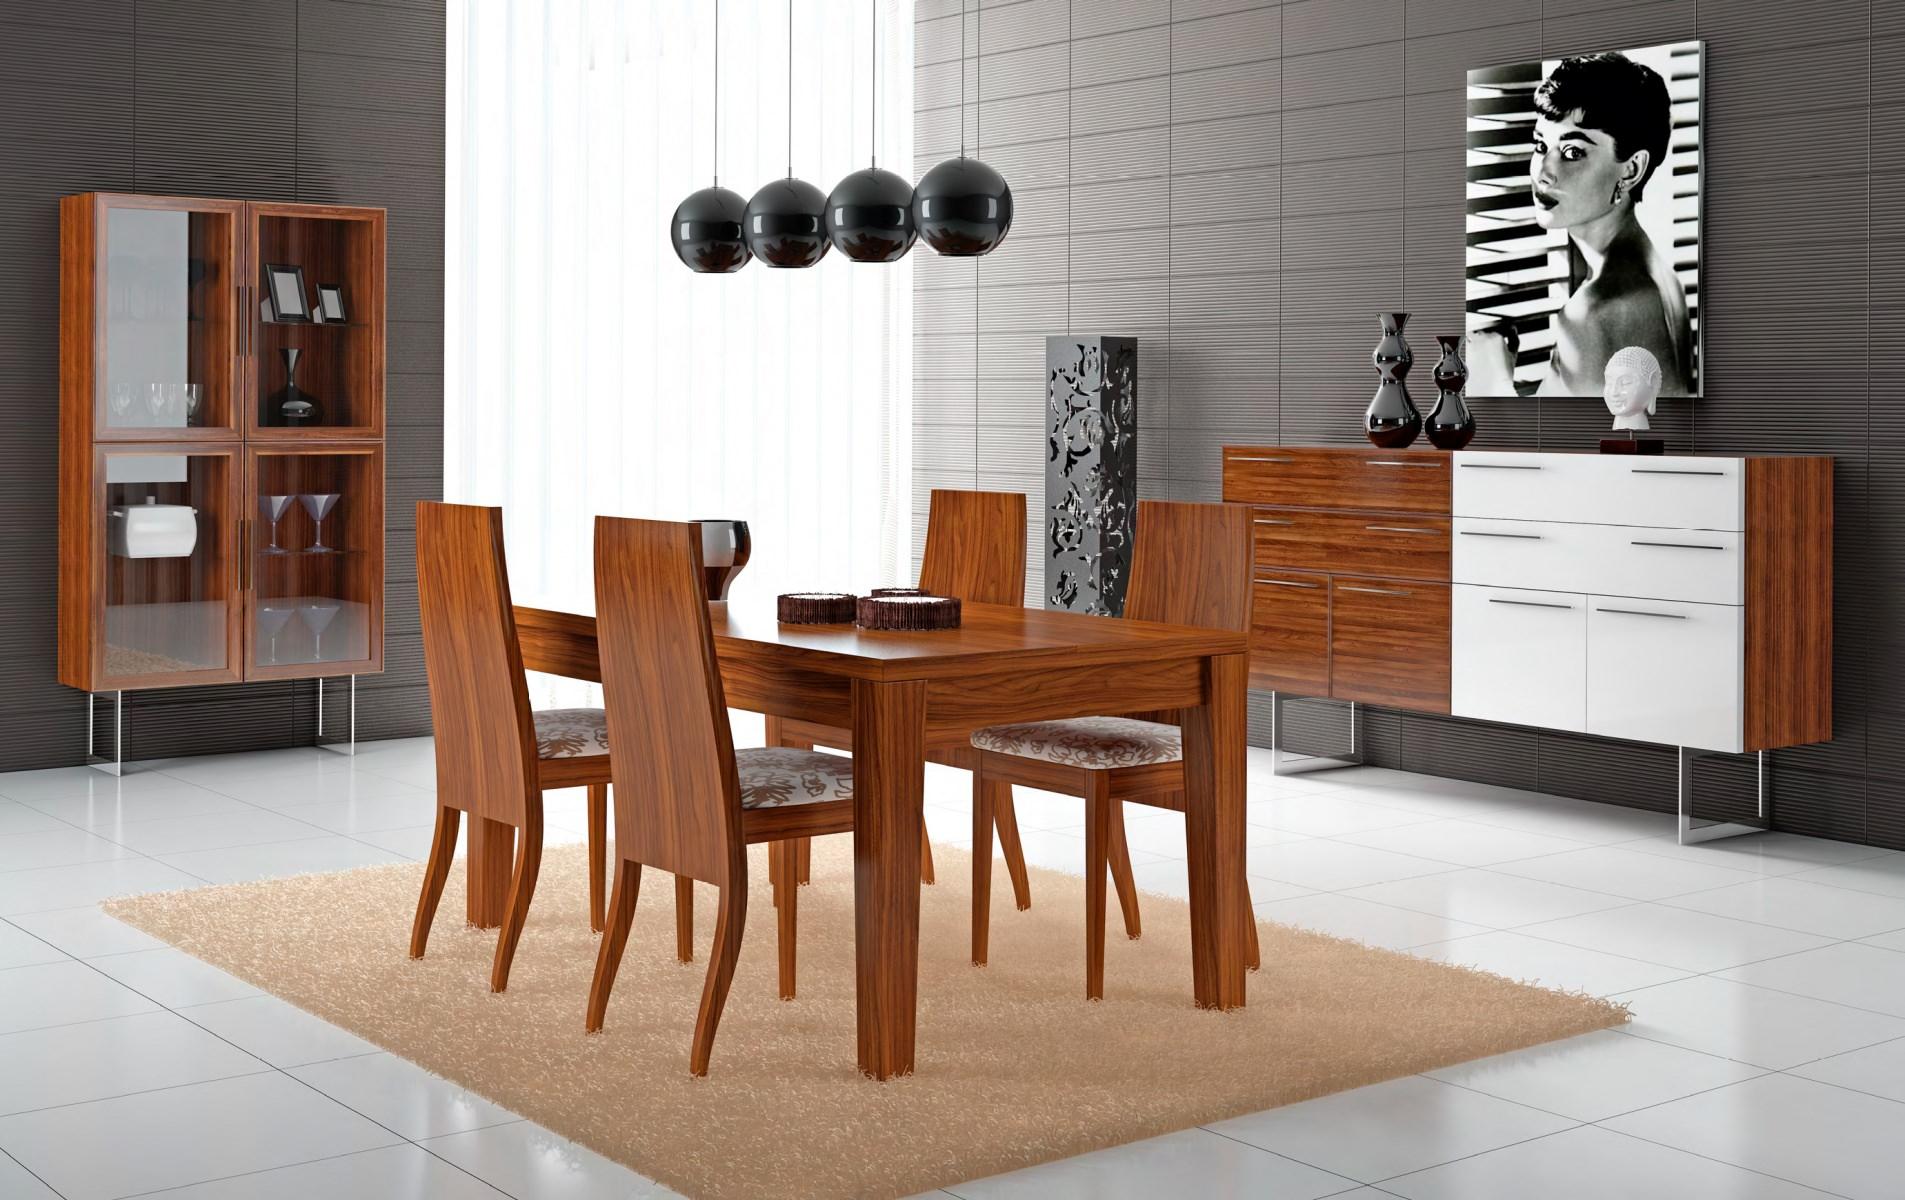 Обеденный стол Calipso 801320 Lino